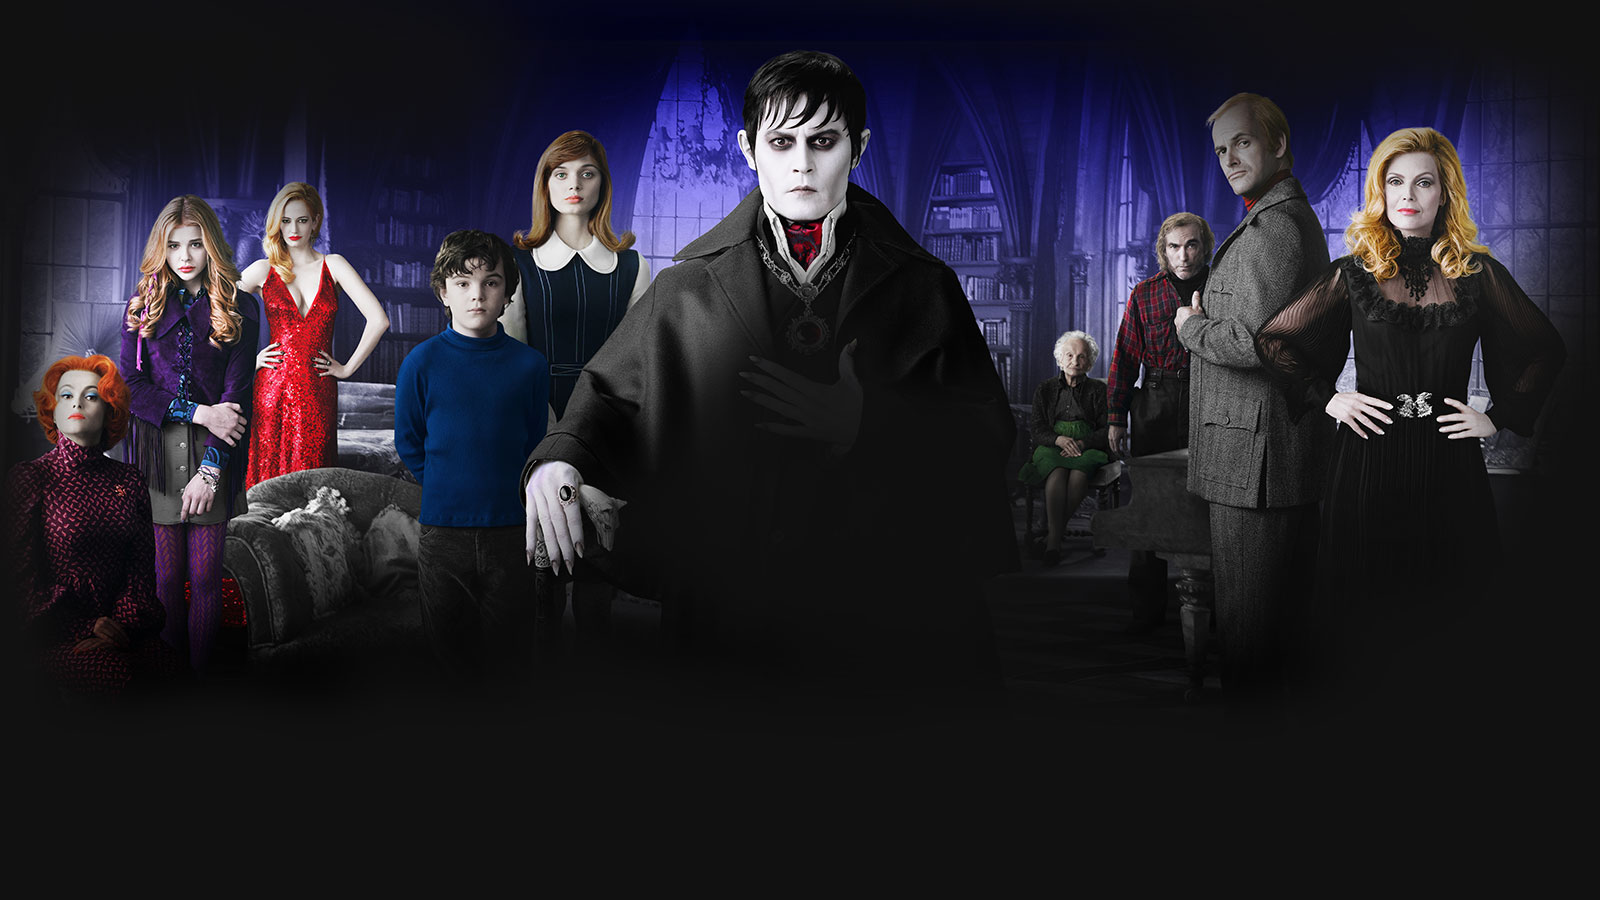 Dark Shadows 2012 - Movies Wallpaper (29774222) - Fanpop Nightmare Before Christmas Jack